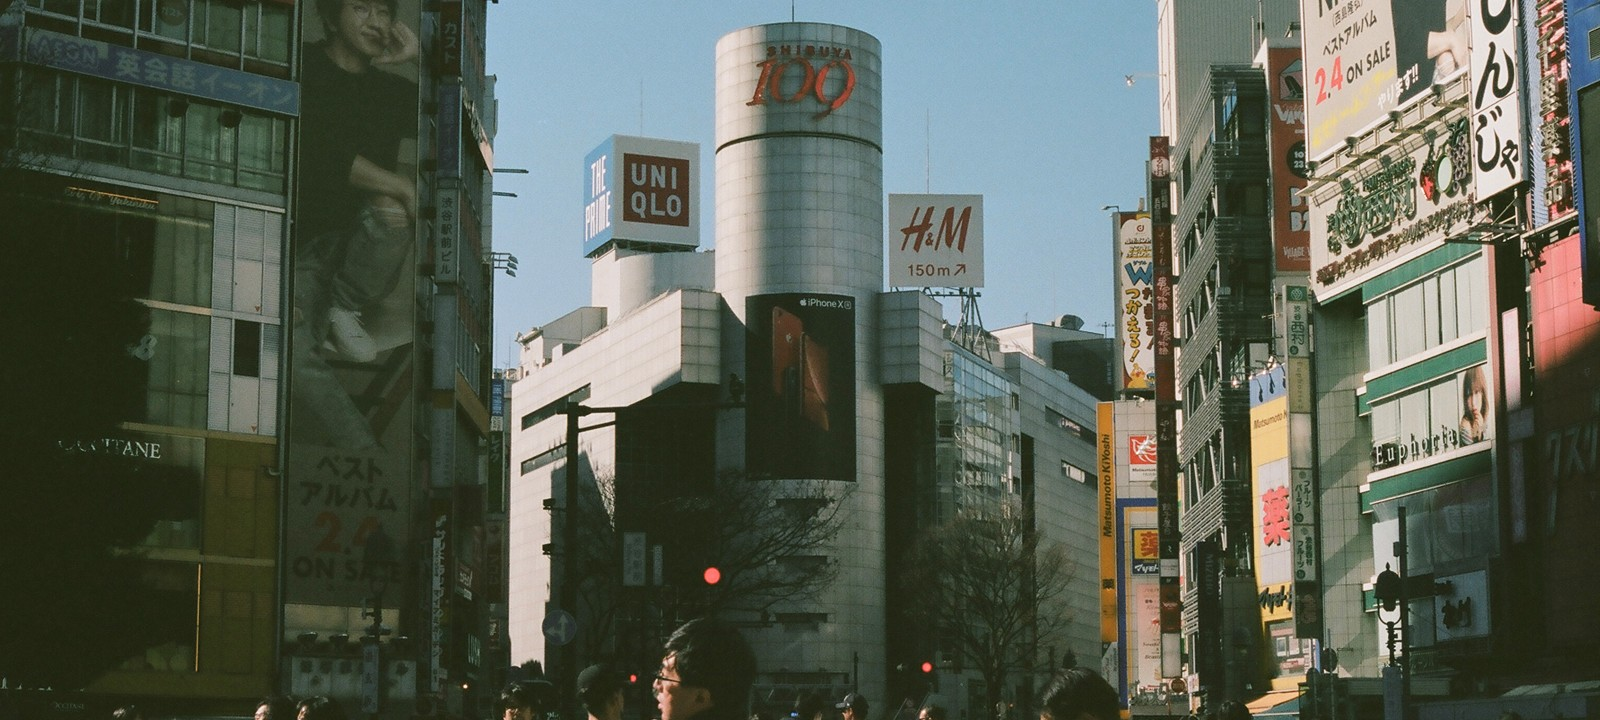 Tokyo Japan Japanese Capital Shibuya Crossing 109 Streets City Buildings 2019